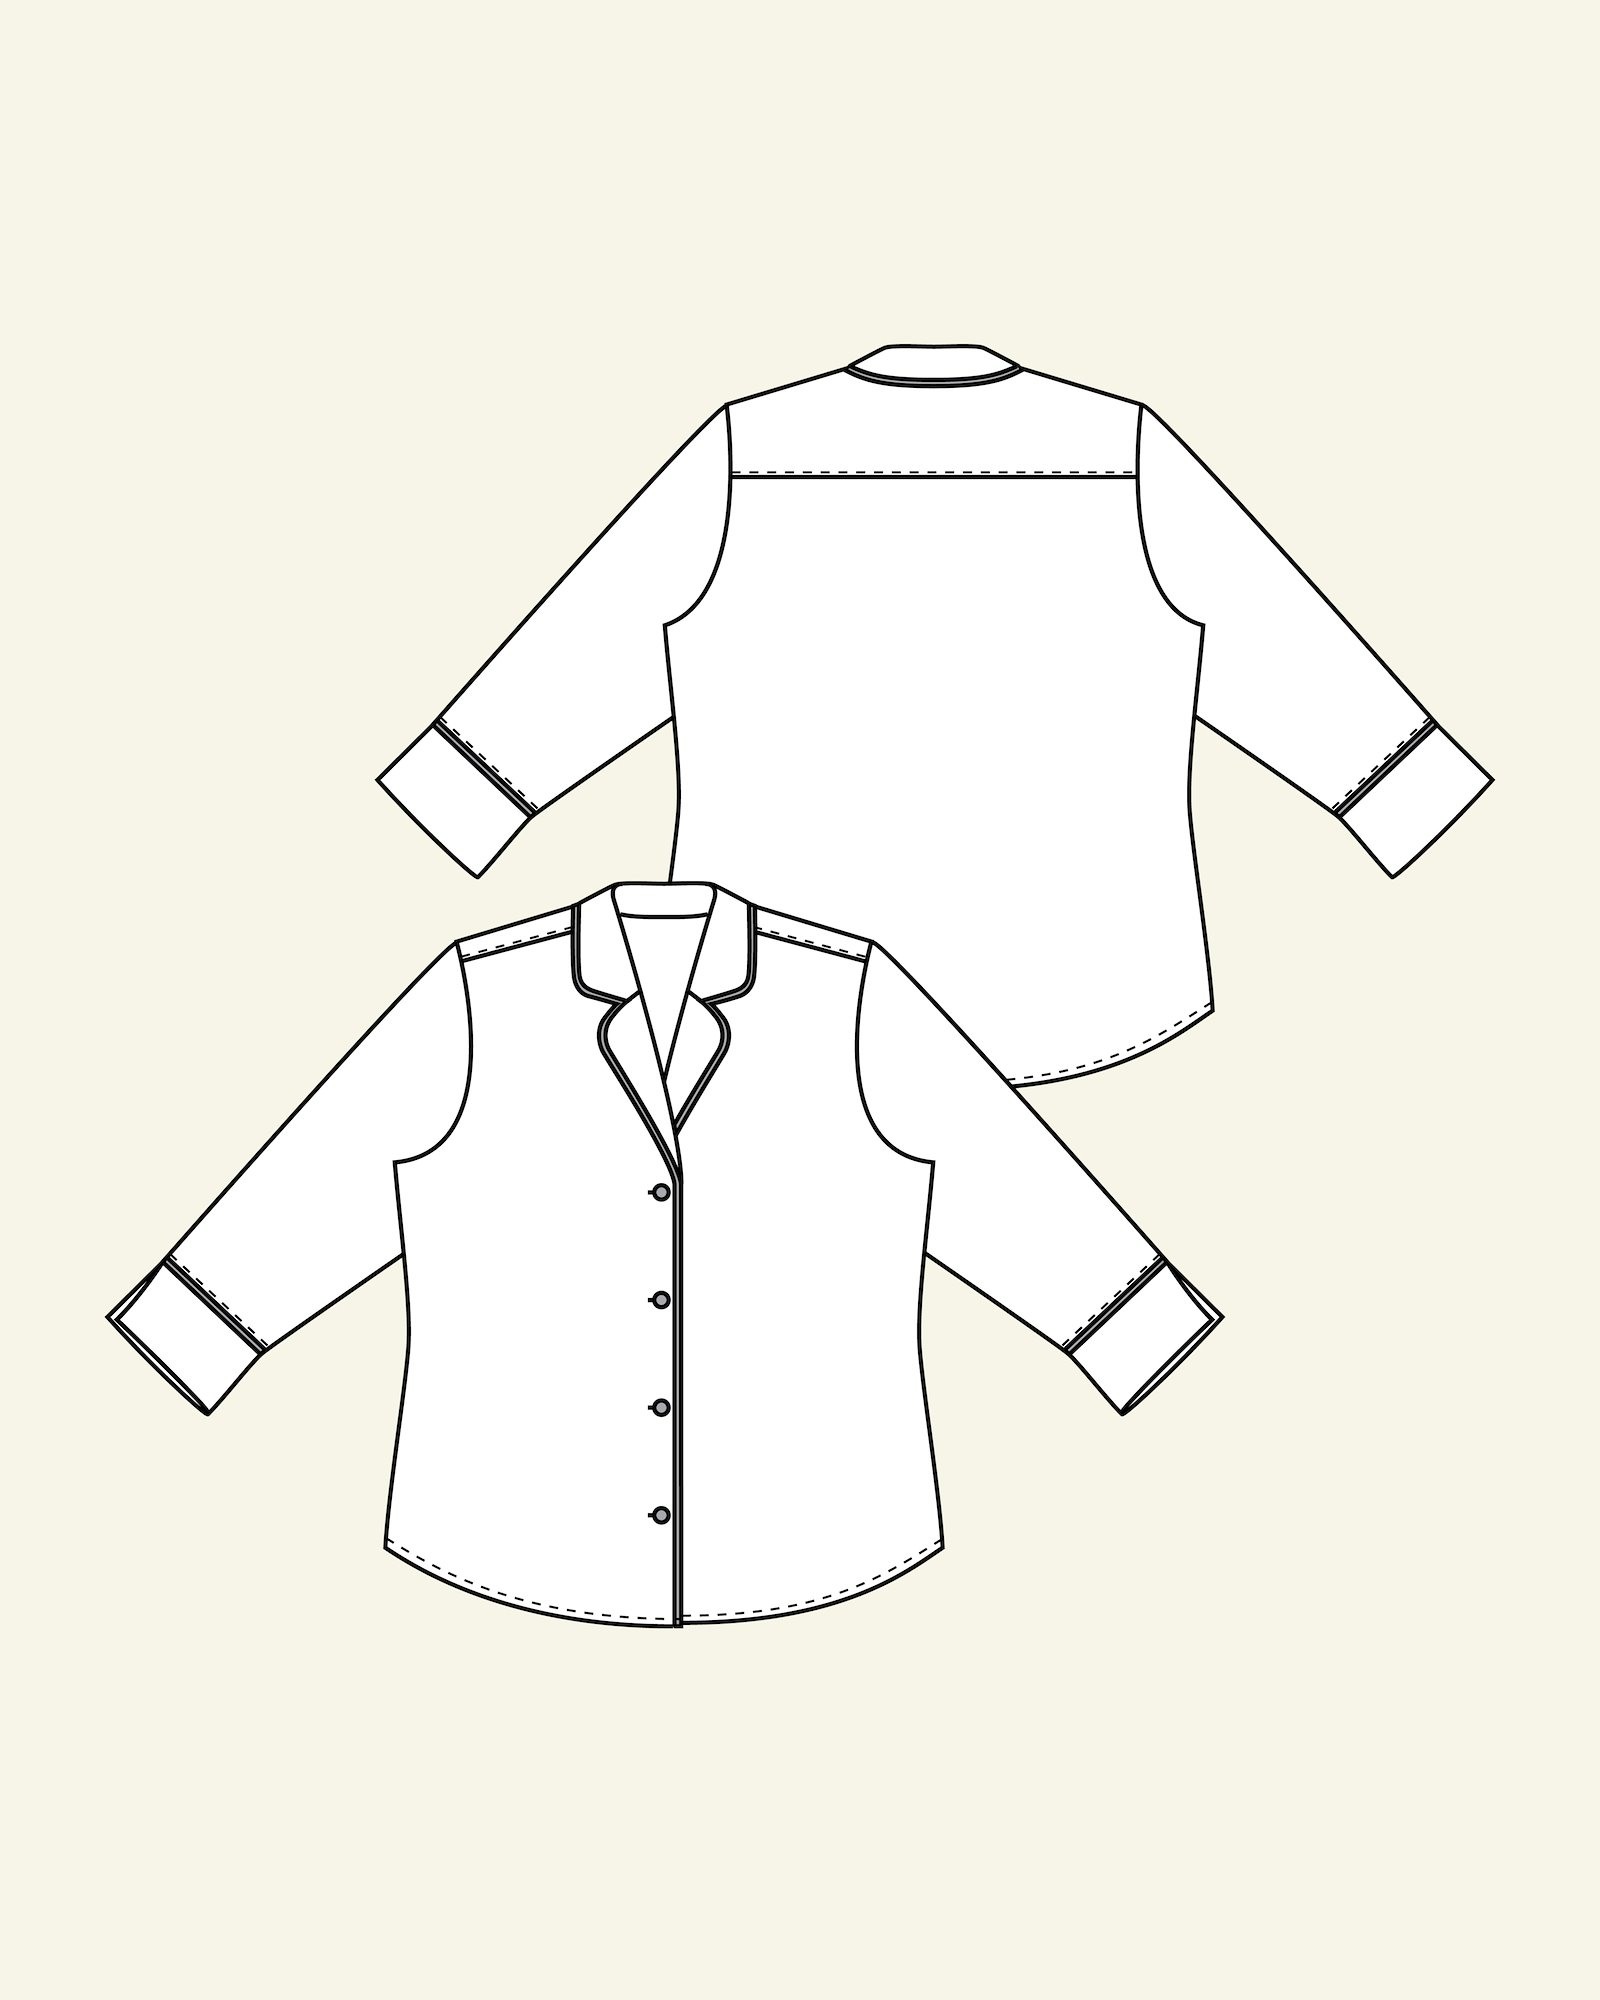 Shirt with ¾ sleeve length